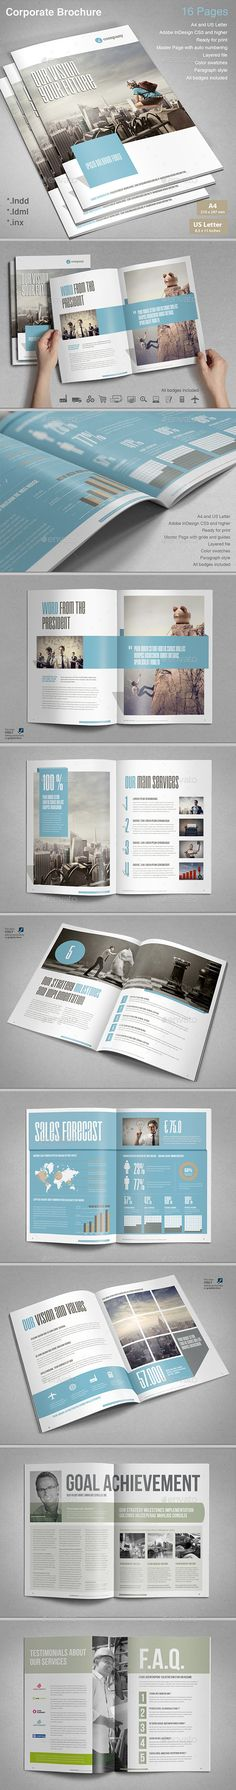 Corporate Brochure Template #design Download: http://graphicriver.net/item/corporate-brochure-vol2/12905122?ref=ksioks